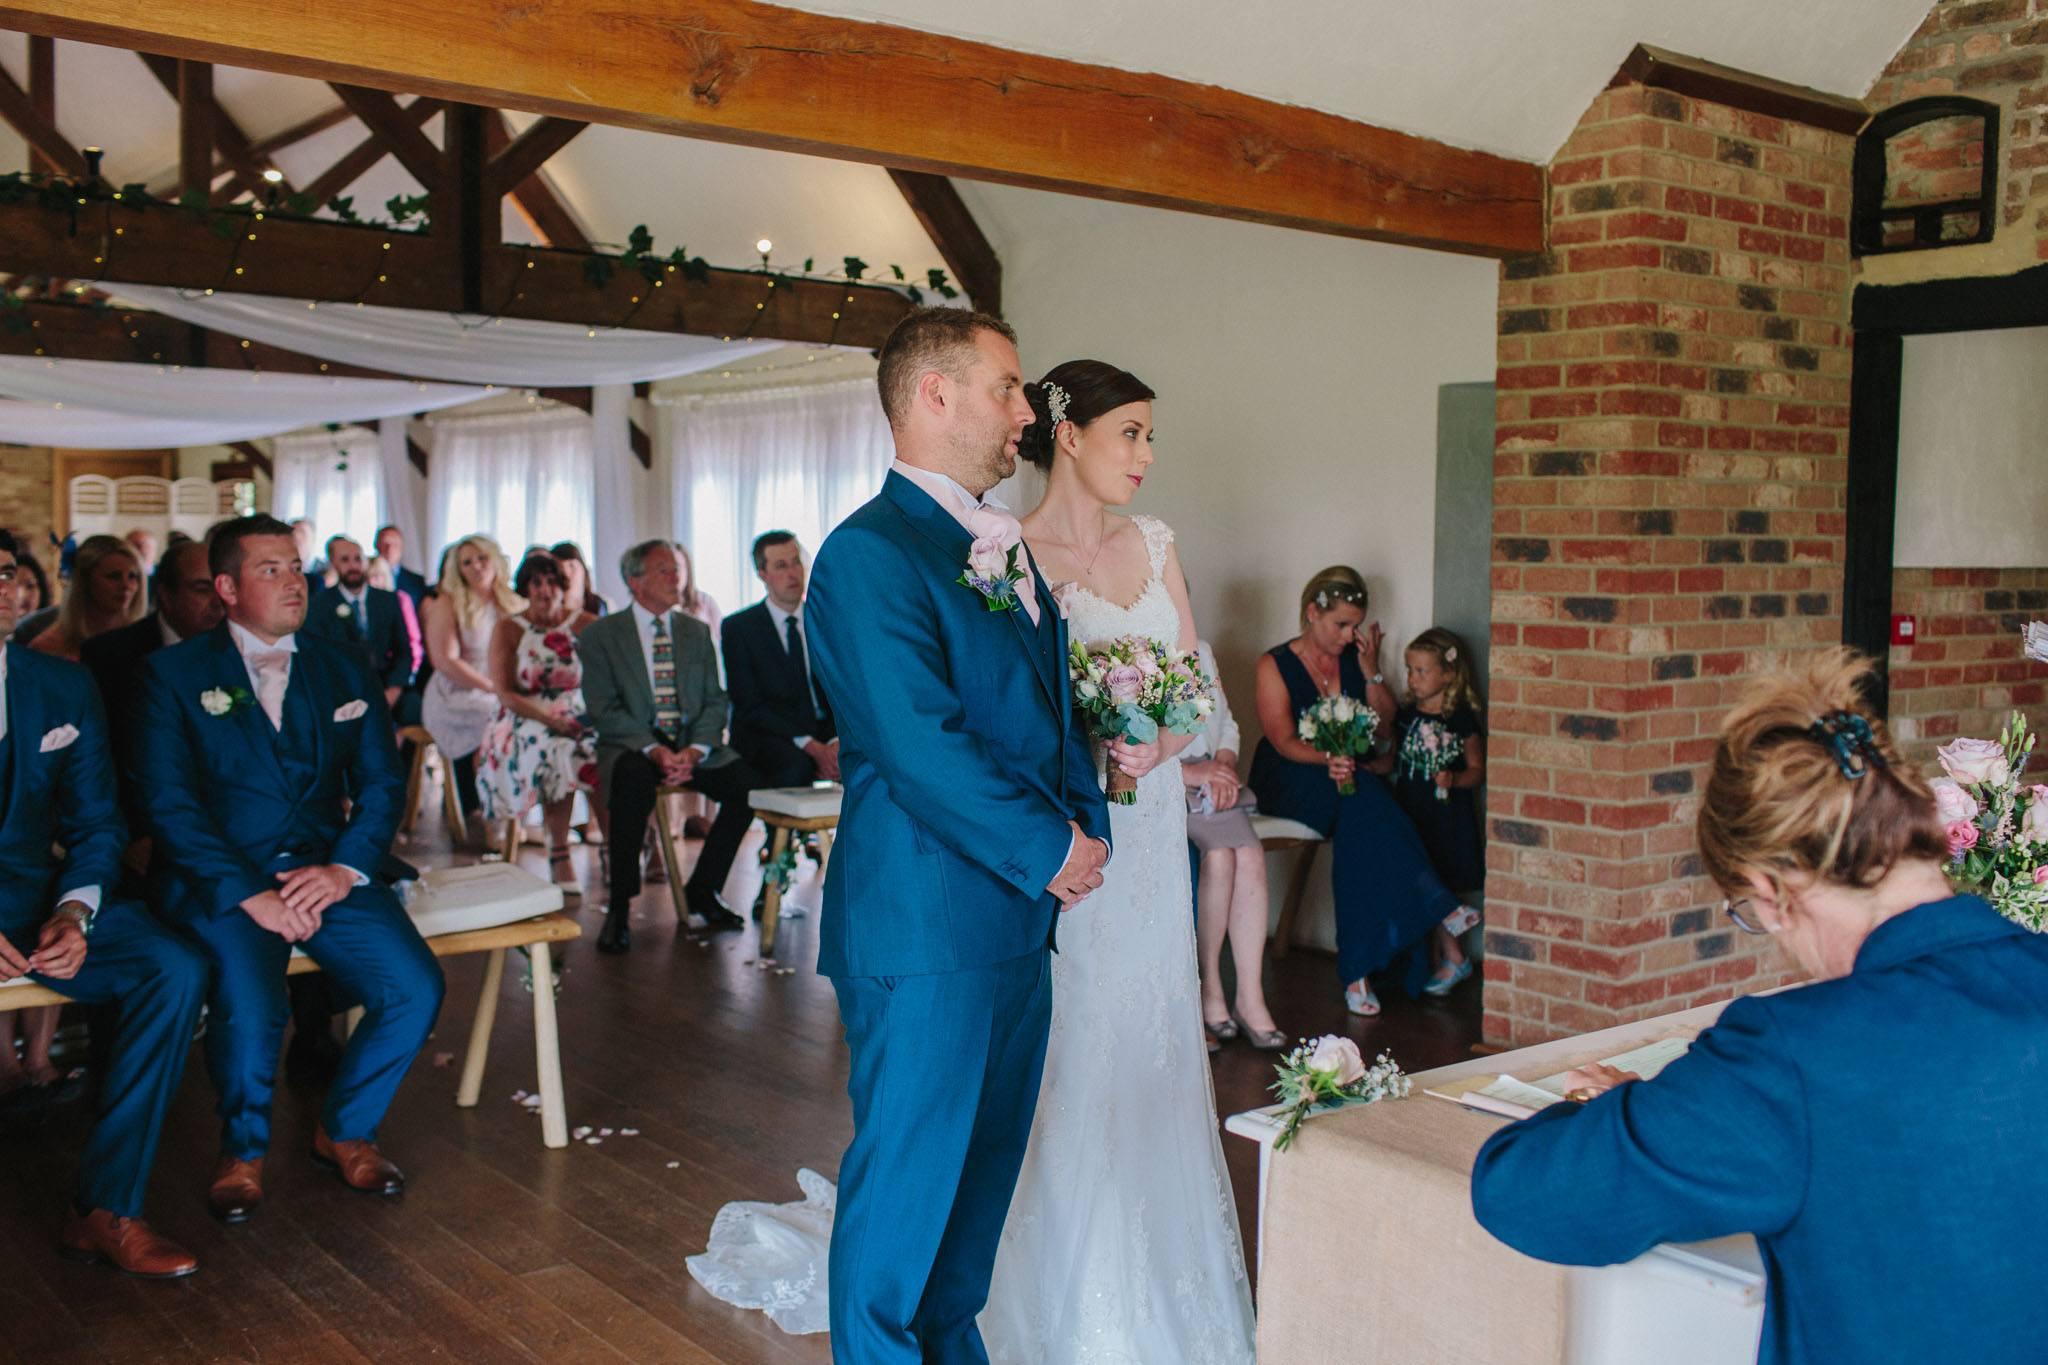 sussex wedding, reportage wedding photography